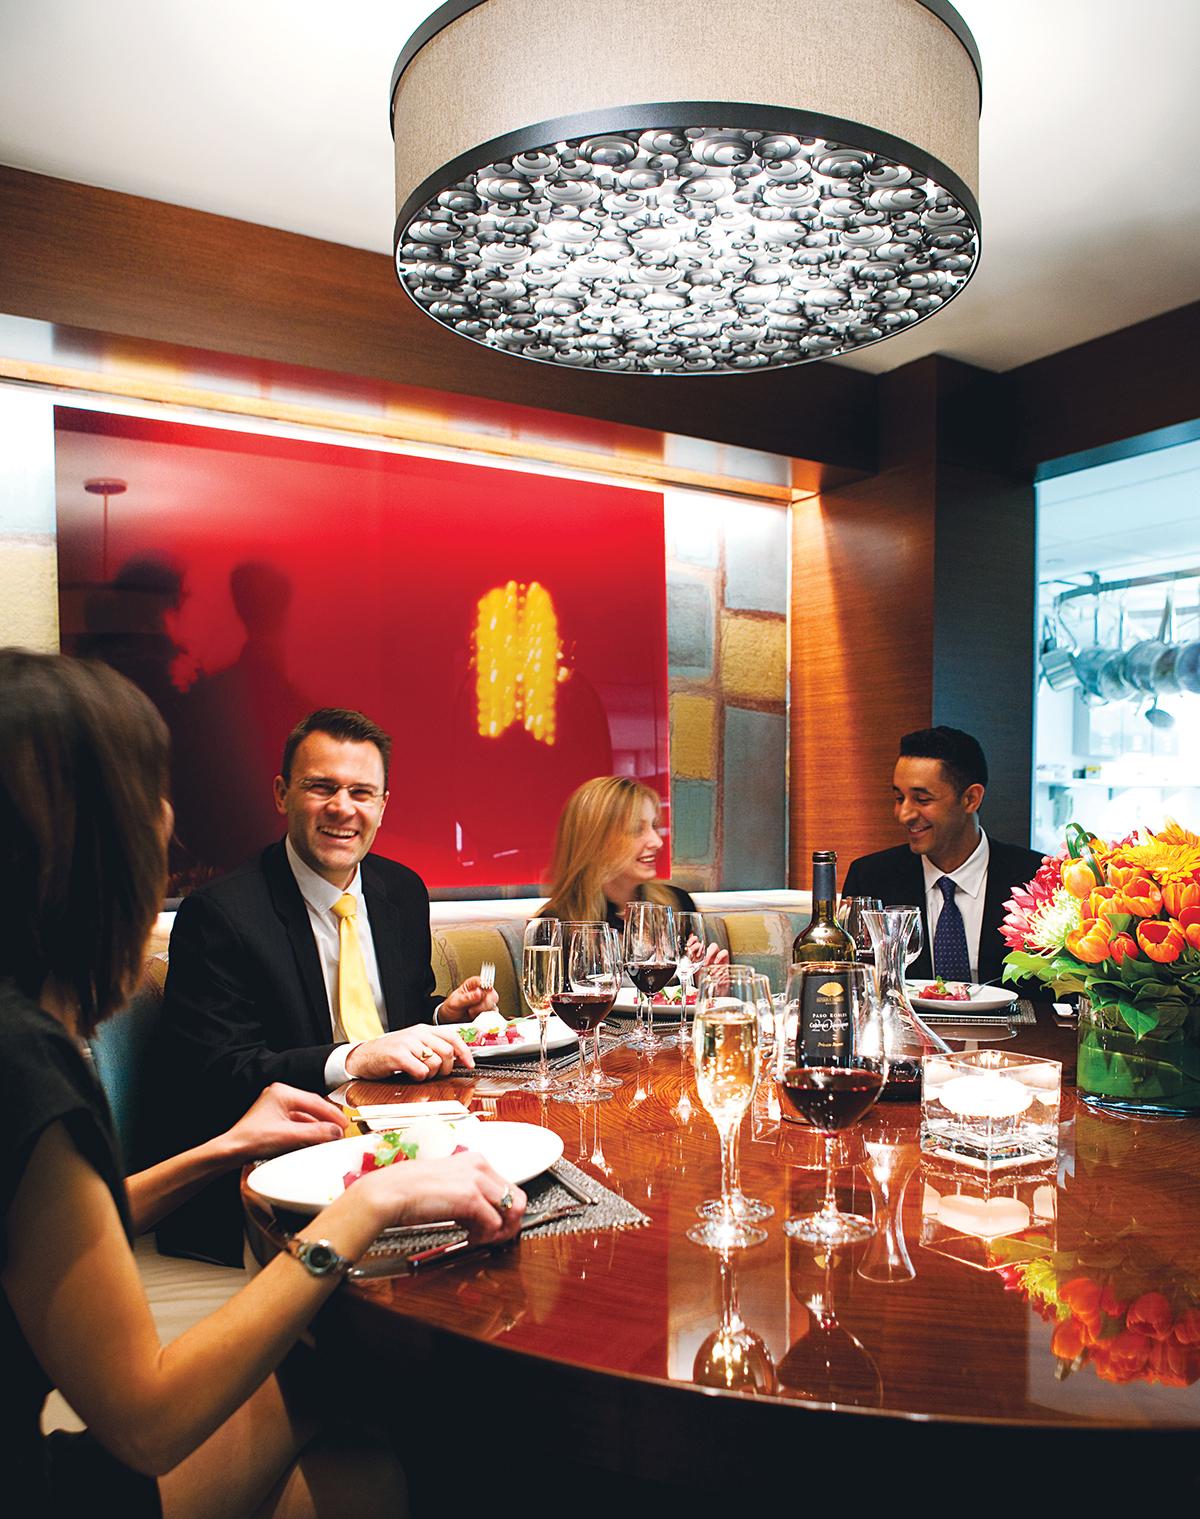 The chef's table at Asana in the Mandarin Oriental. Photograph by Keller + Keller.